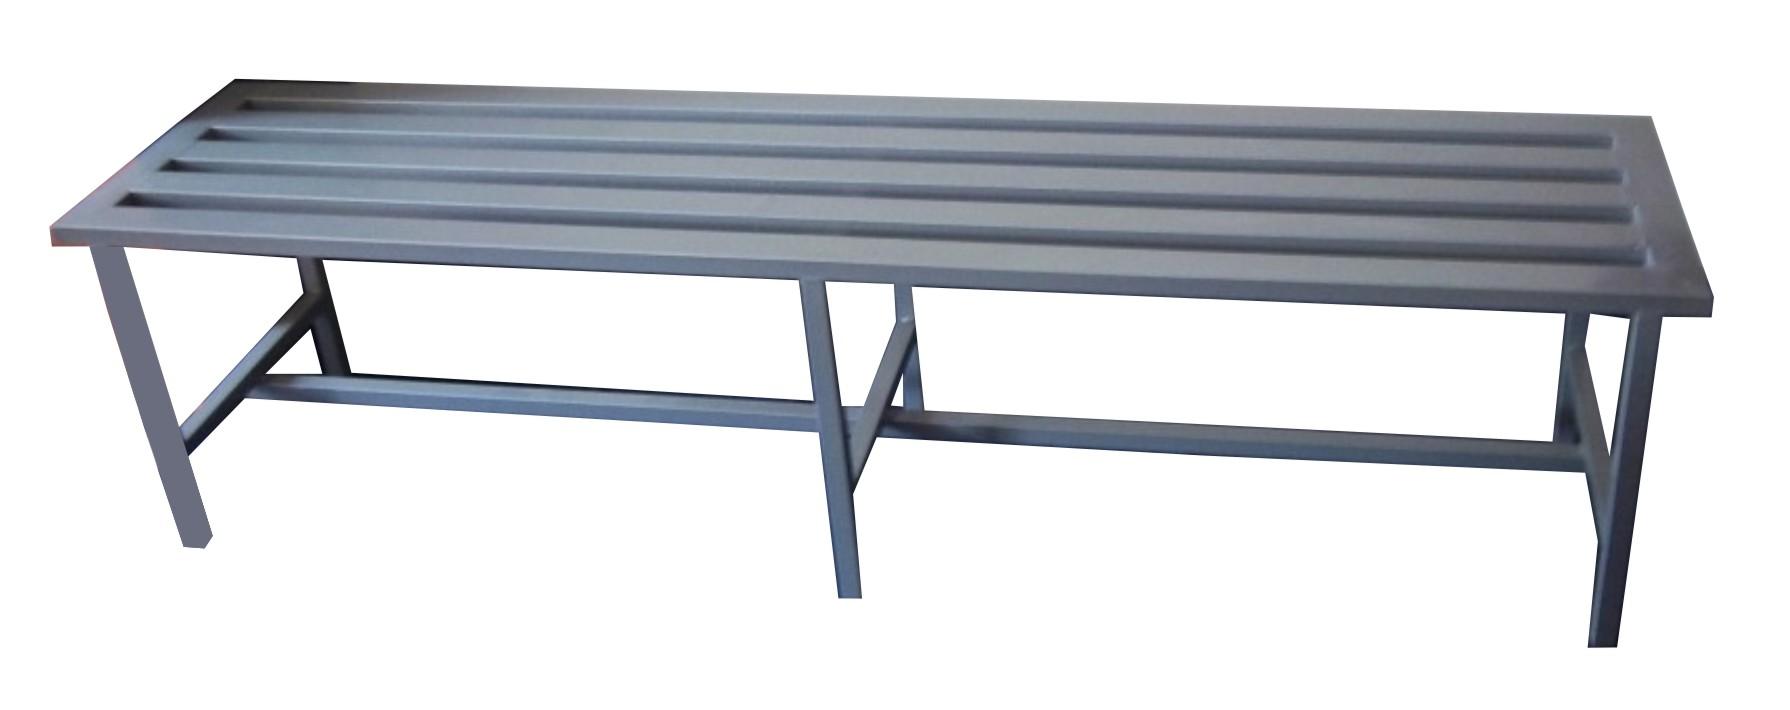 Ofimueble crisma portfolio categories muebles metalicos - Muebles de chapa metalica ...